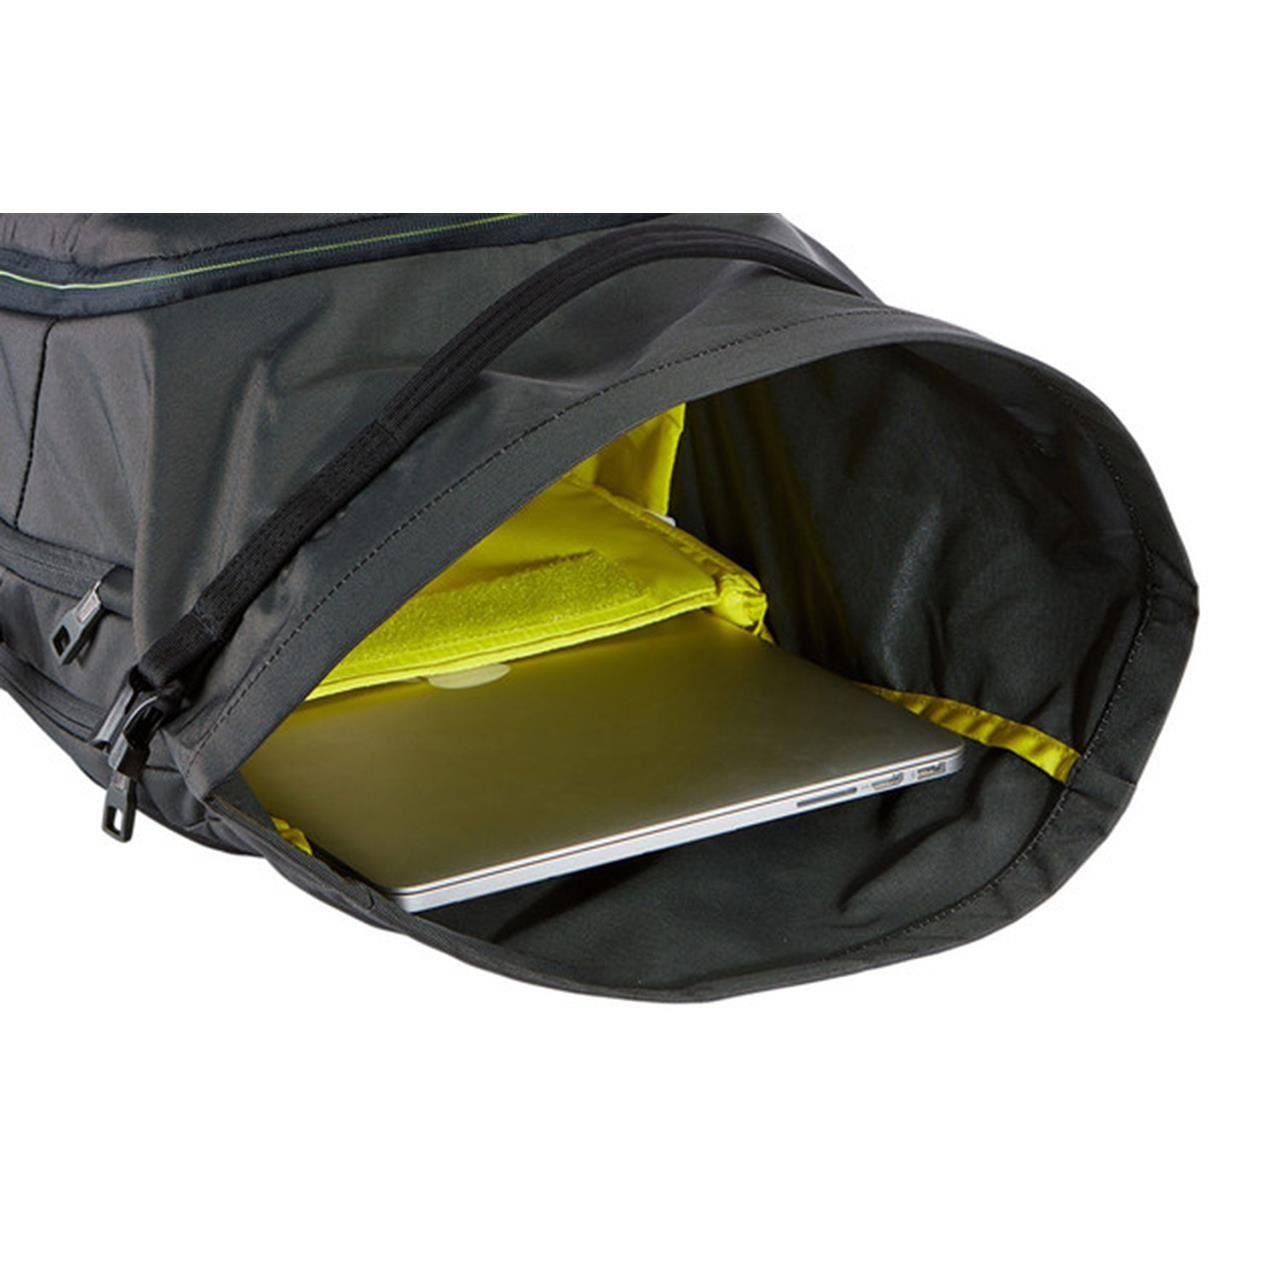 Rucsac urban cu compartiment laptop Thule Subterra Travel Backpack 34L Dark Shadow 7